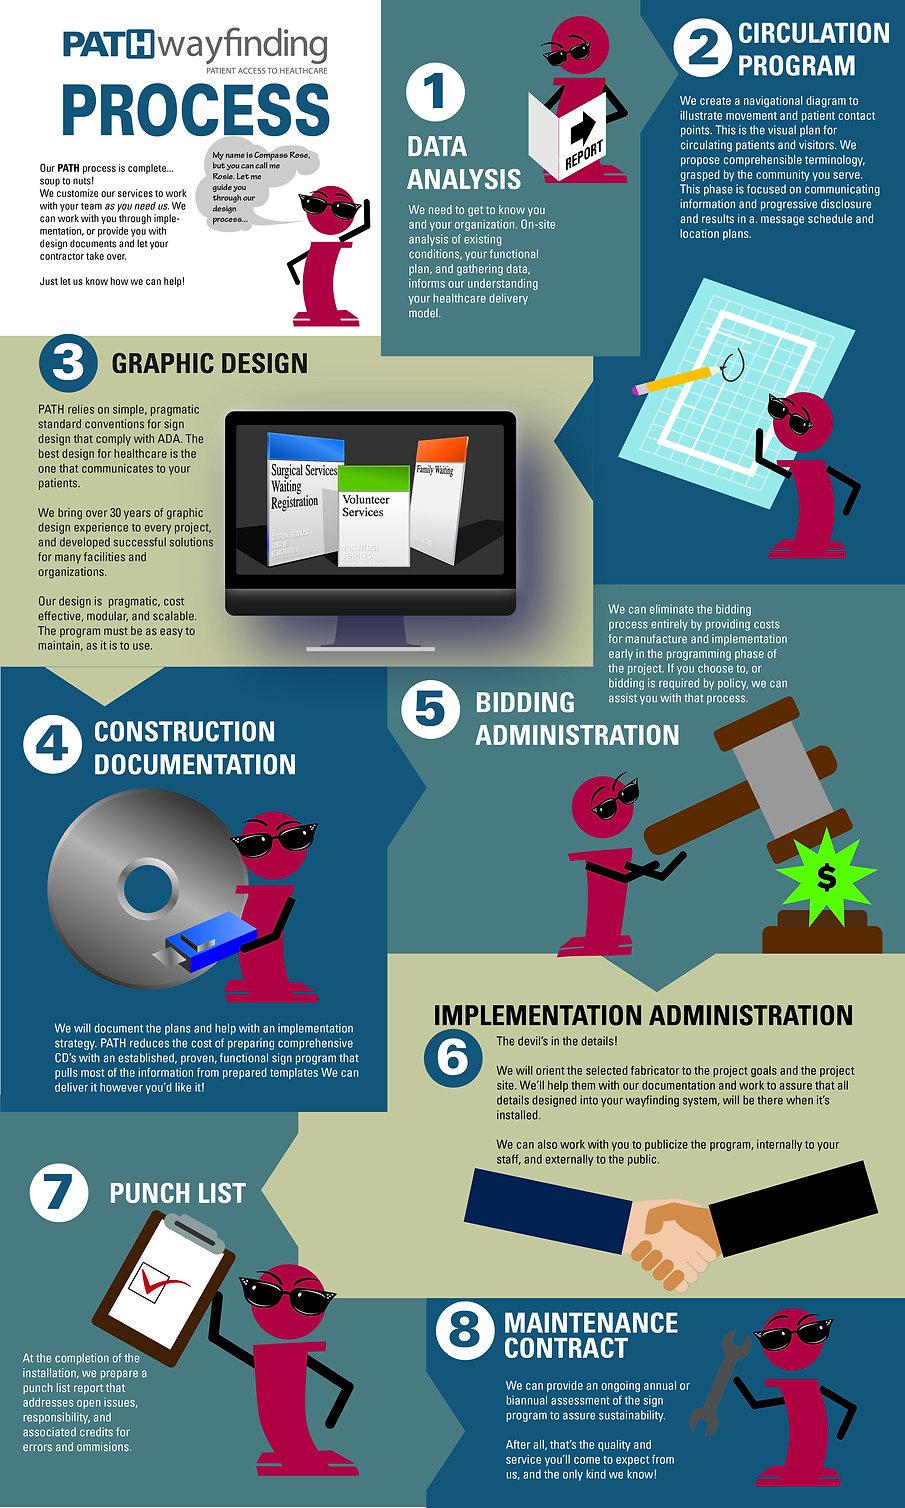 PATHwayfinding Infographic - Process